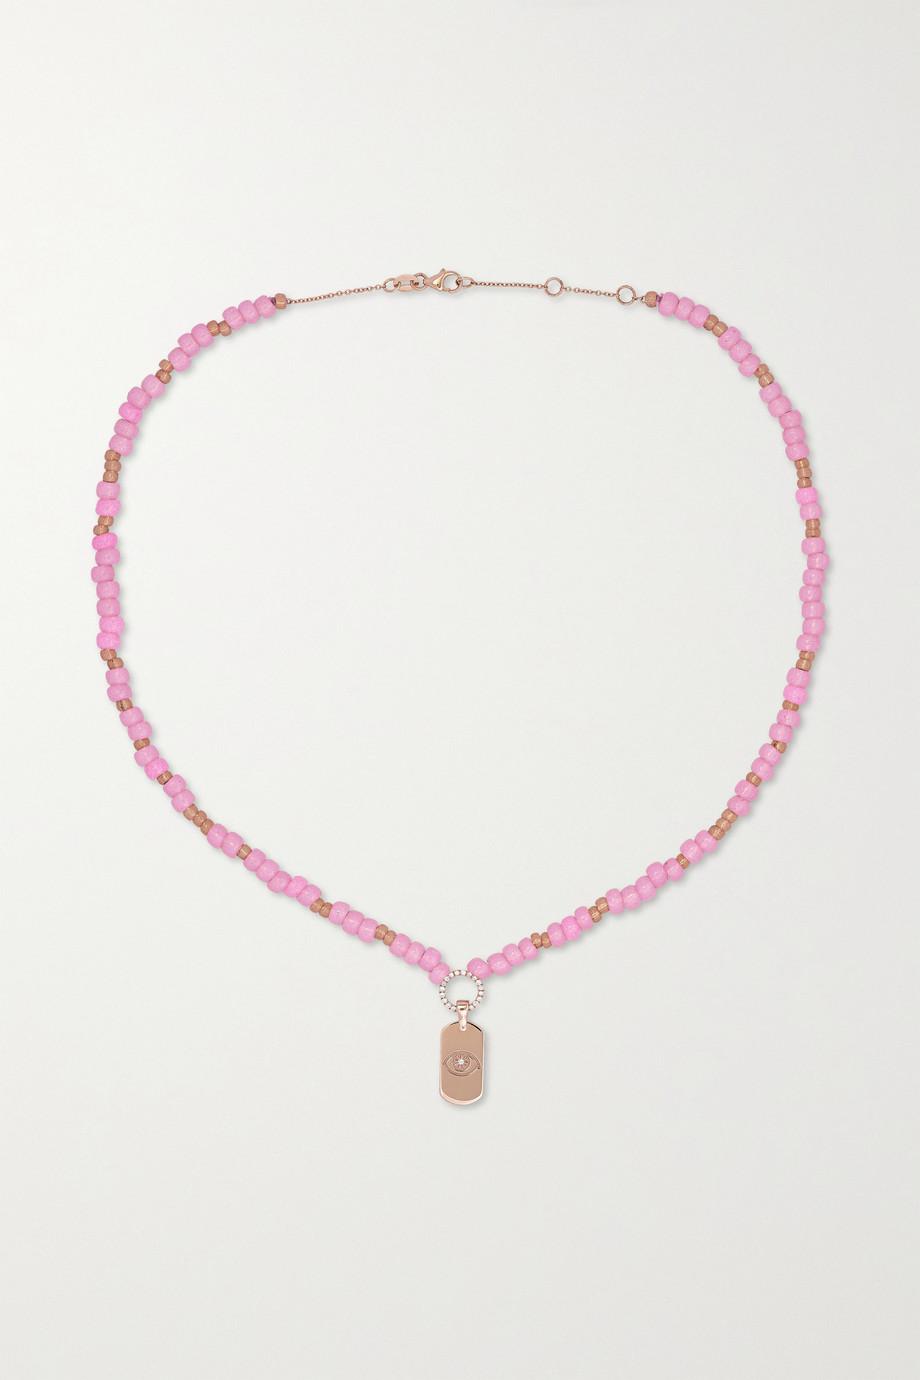 Diane Kordas ID 14-karat rose gold, bead and diamond necklace